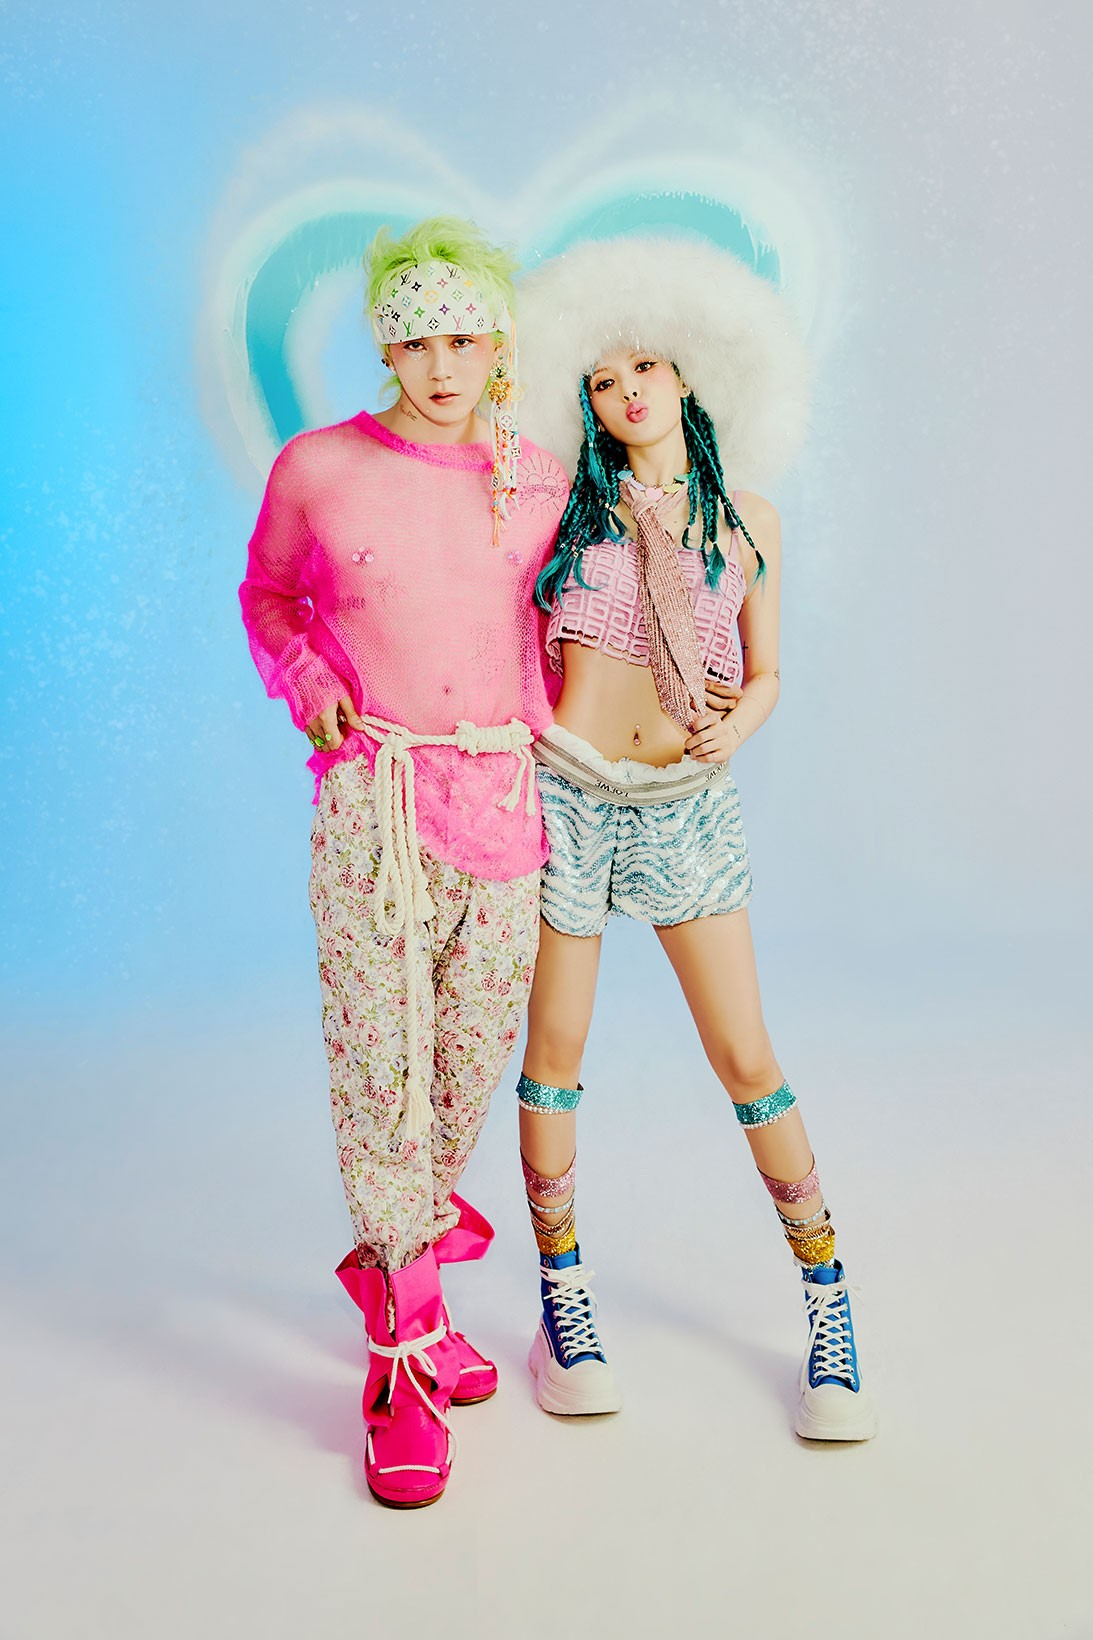 HyunA DAWN Duet Mini-Album Ping Pong XOXO Deep Dive I Know P NATION K-pop Music Video Interview